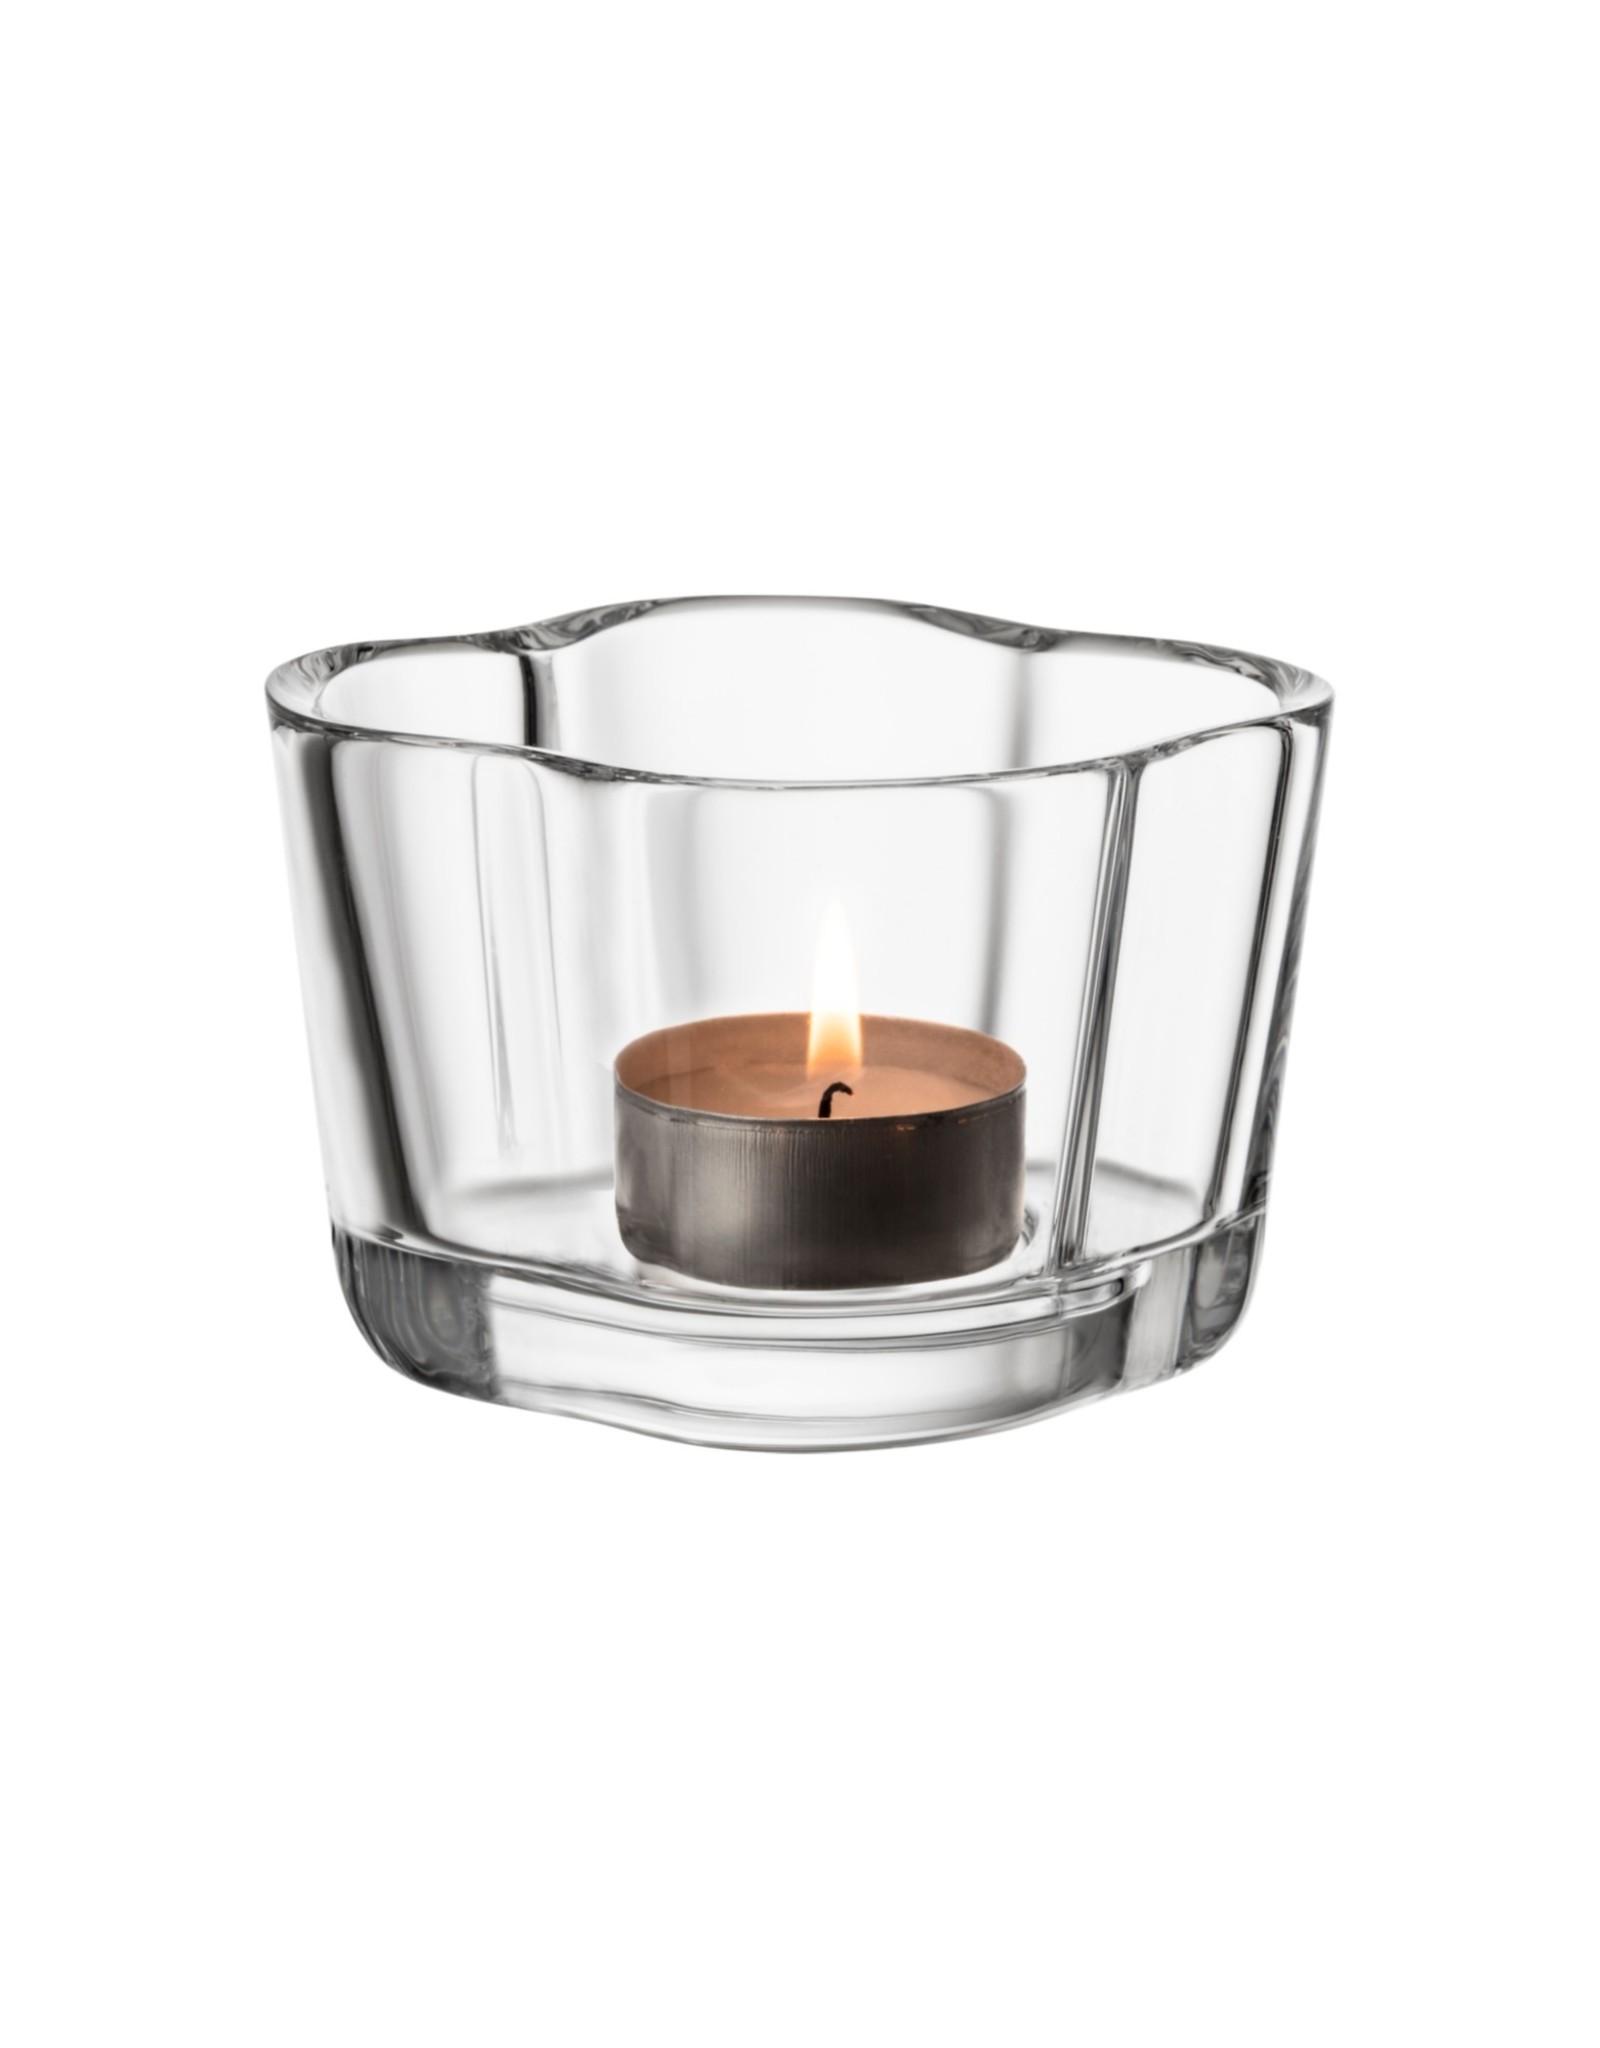 Iittala Iittala Alvar Aalto Collection Waxinelichthouder / Sfeerlicht 60 mm Helder